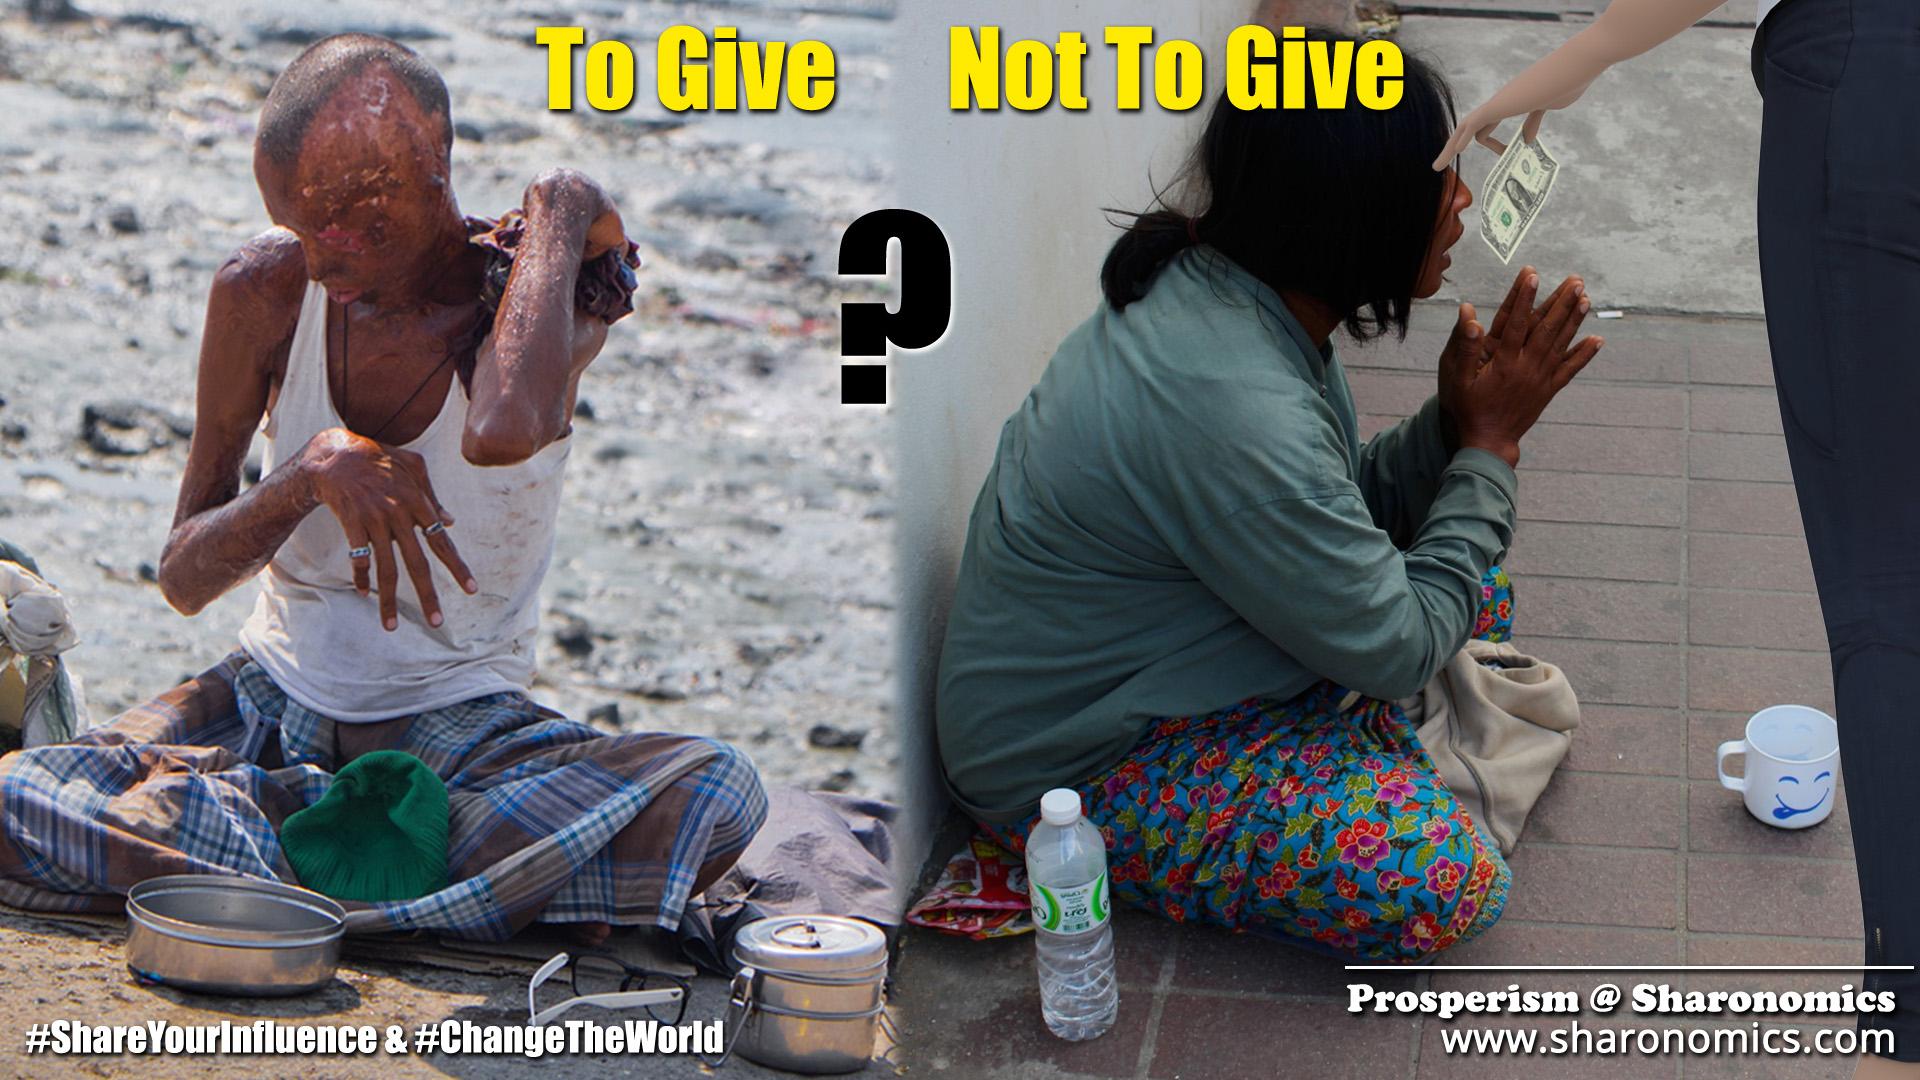 sharonomics, algoshare, prosperism, autonio, poverty, charity, #shareyourinfluence, #changetheworld, give, not give